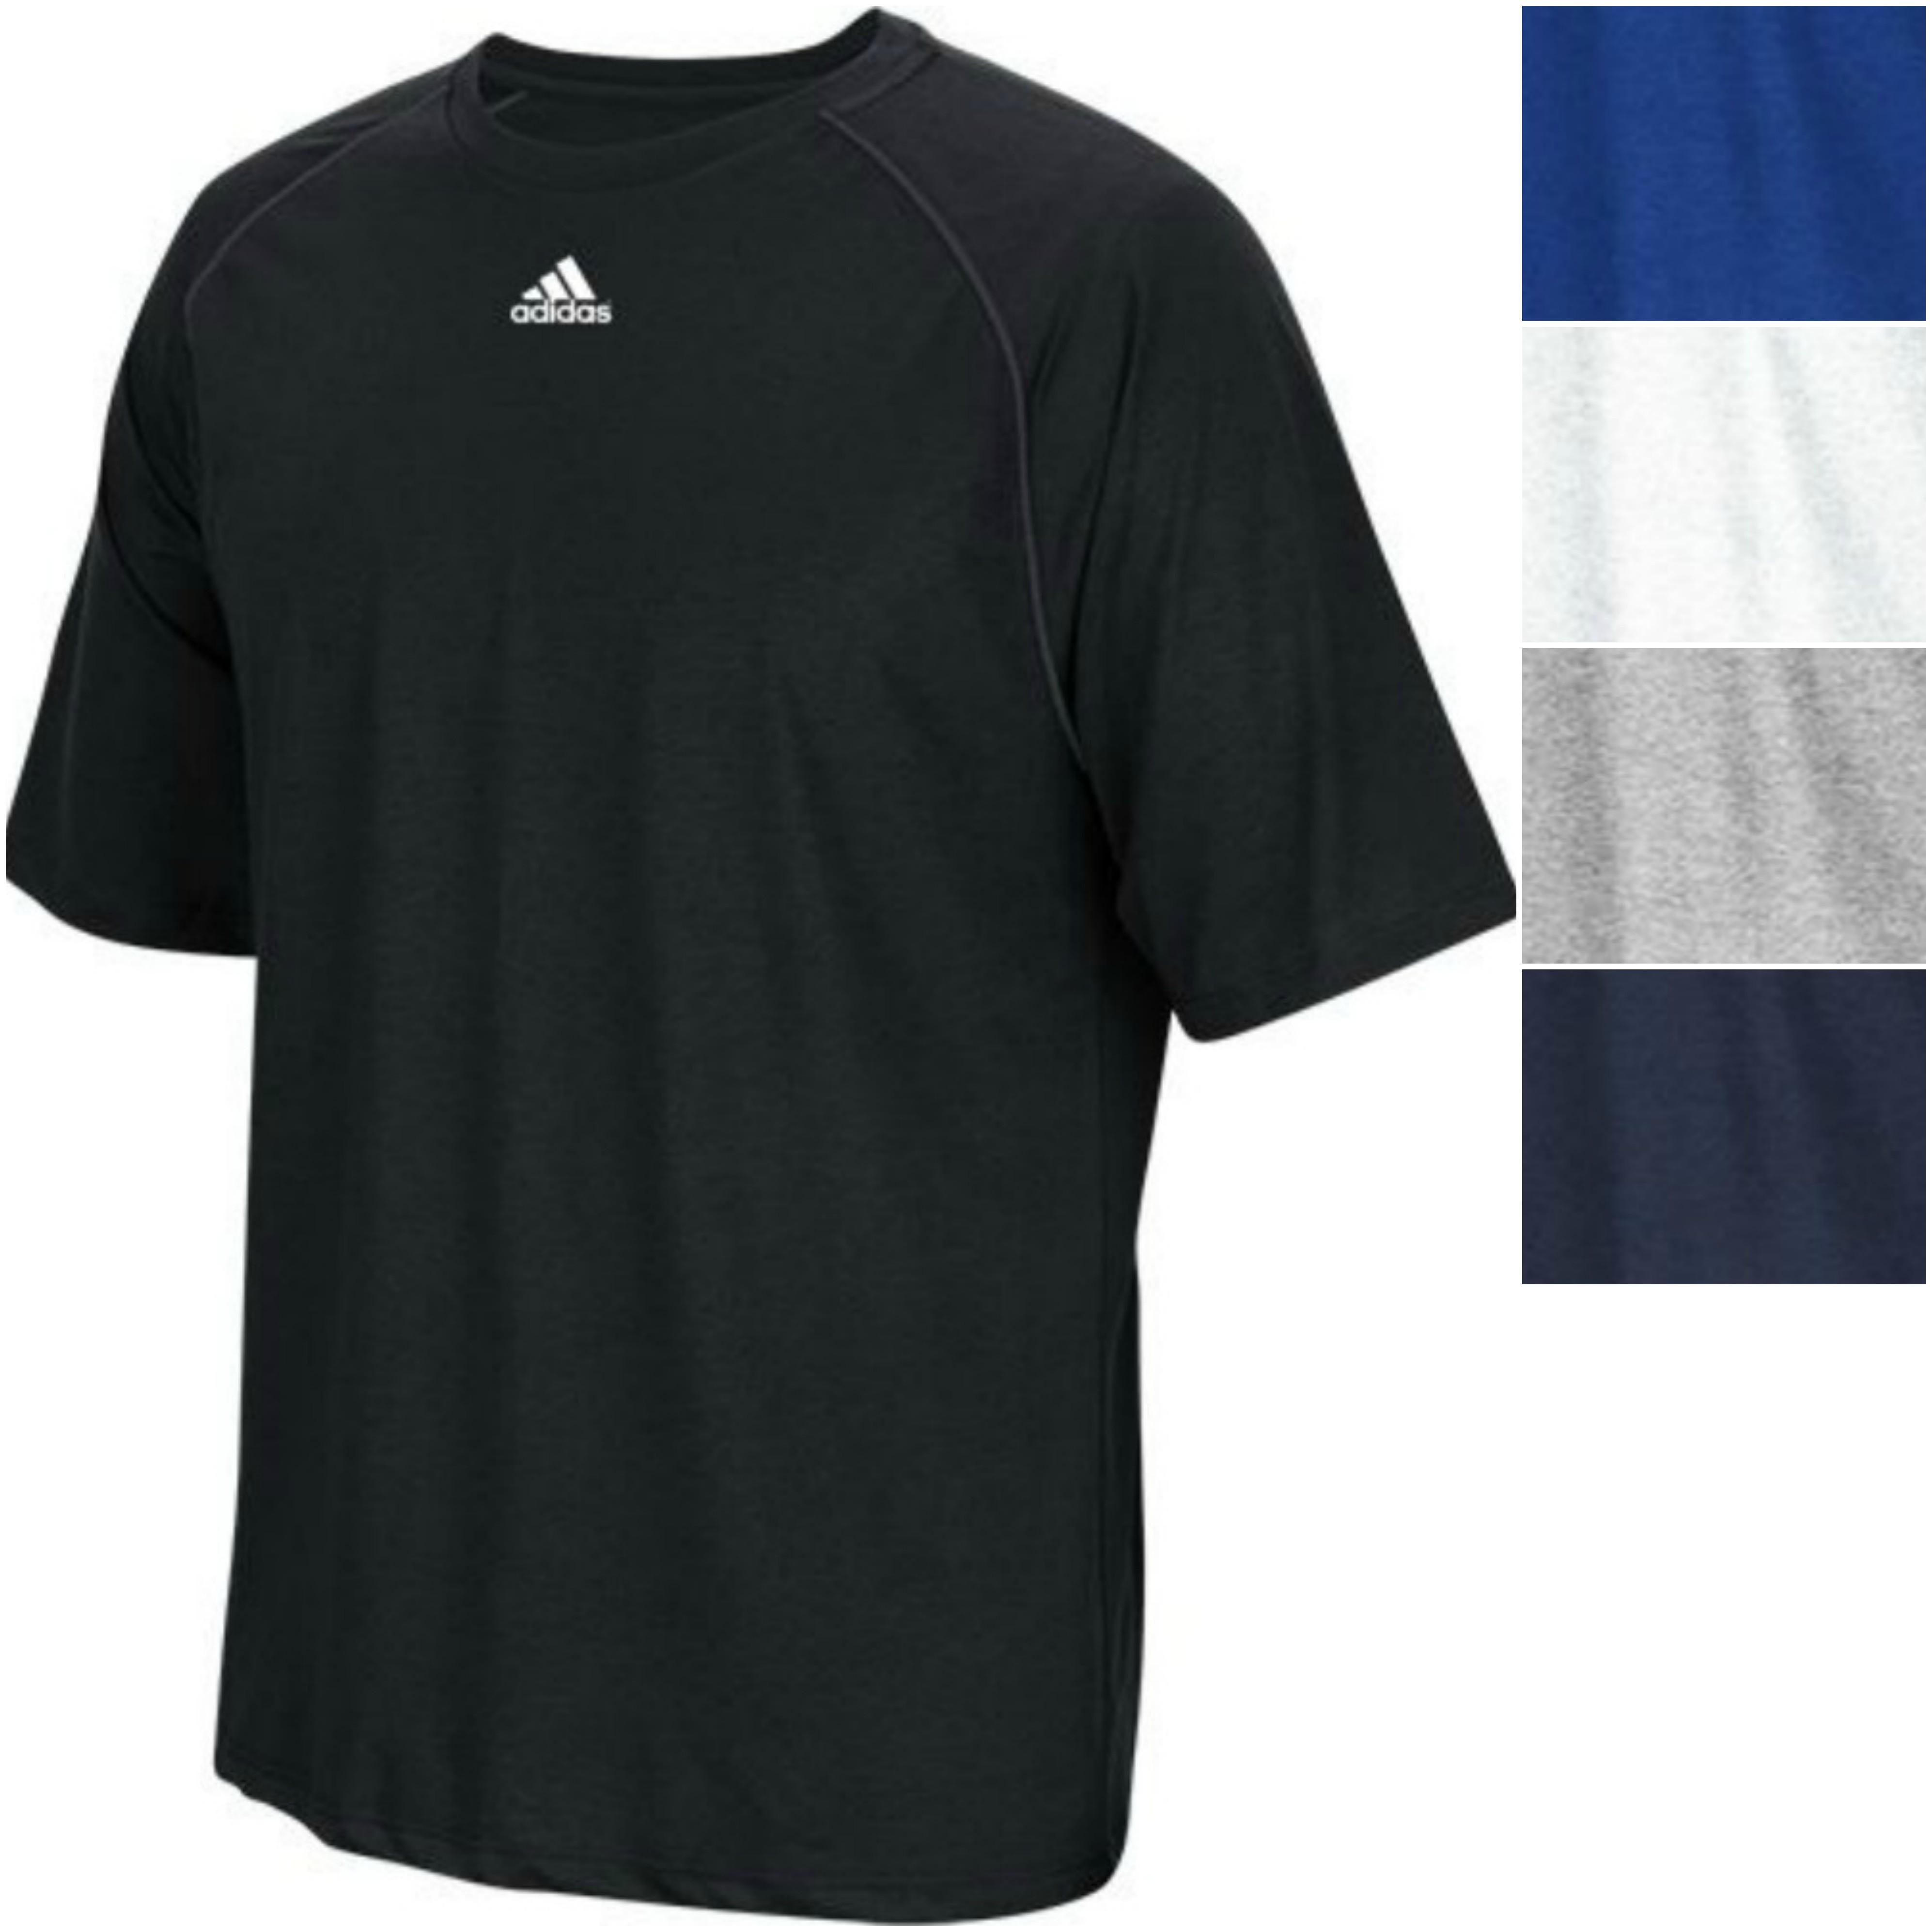 adidas climalite adidas-men-039-s-climalite-short-sleeve-tee- FQJTCHZ